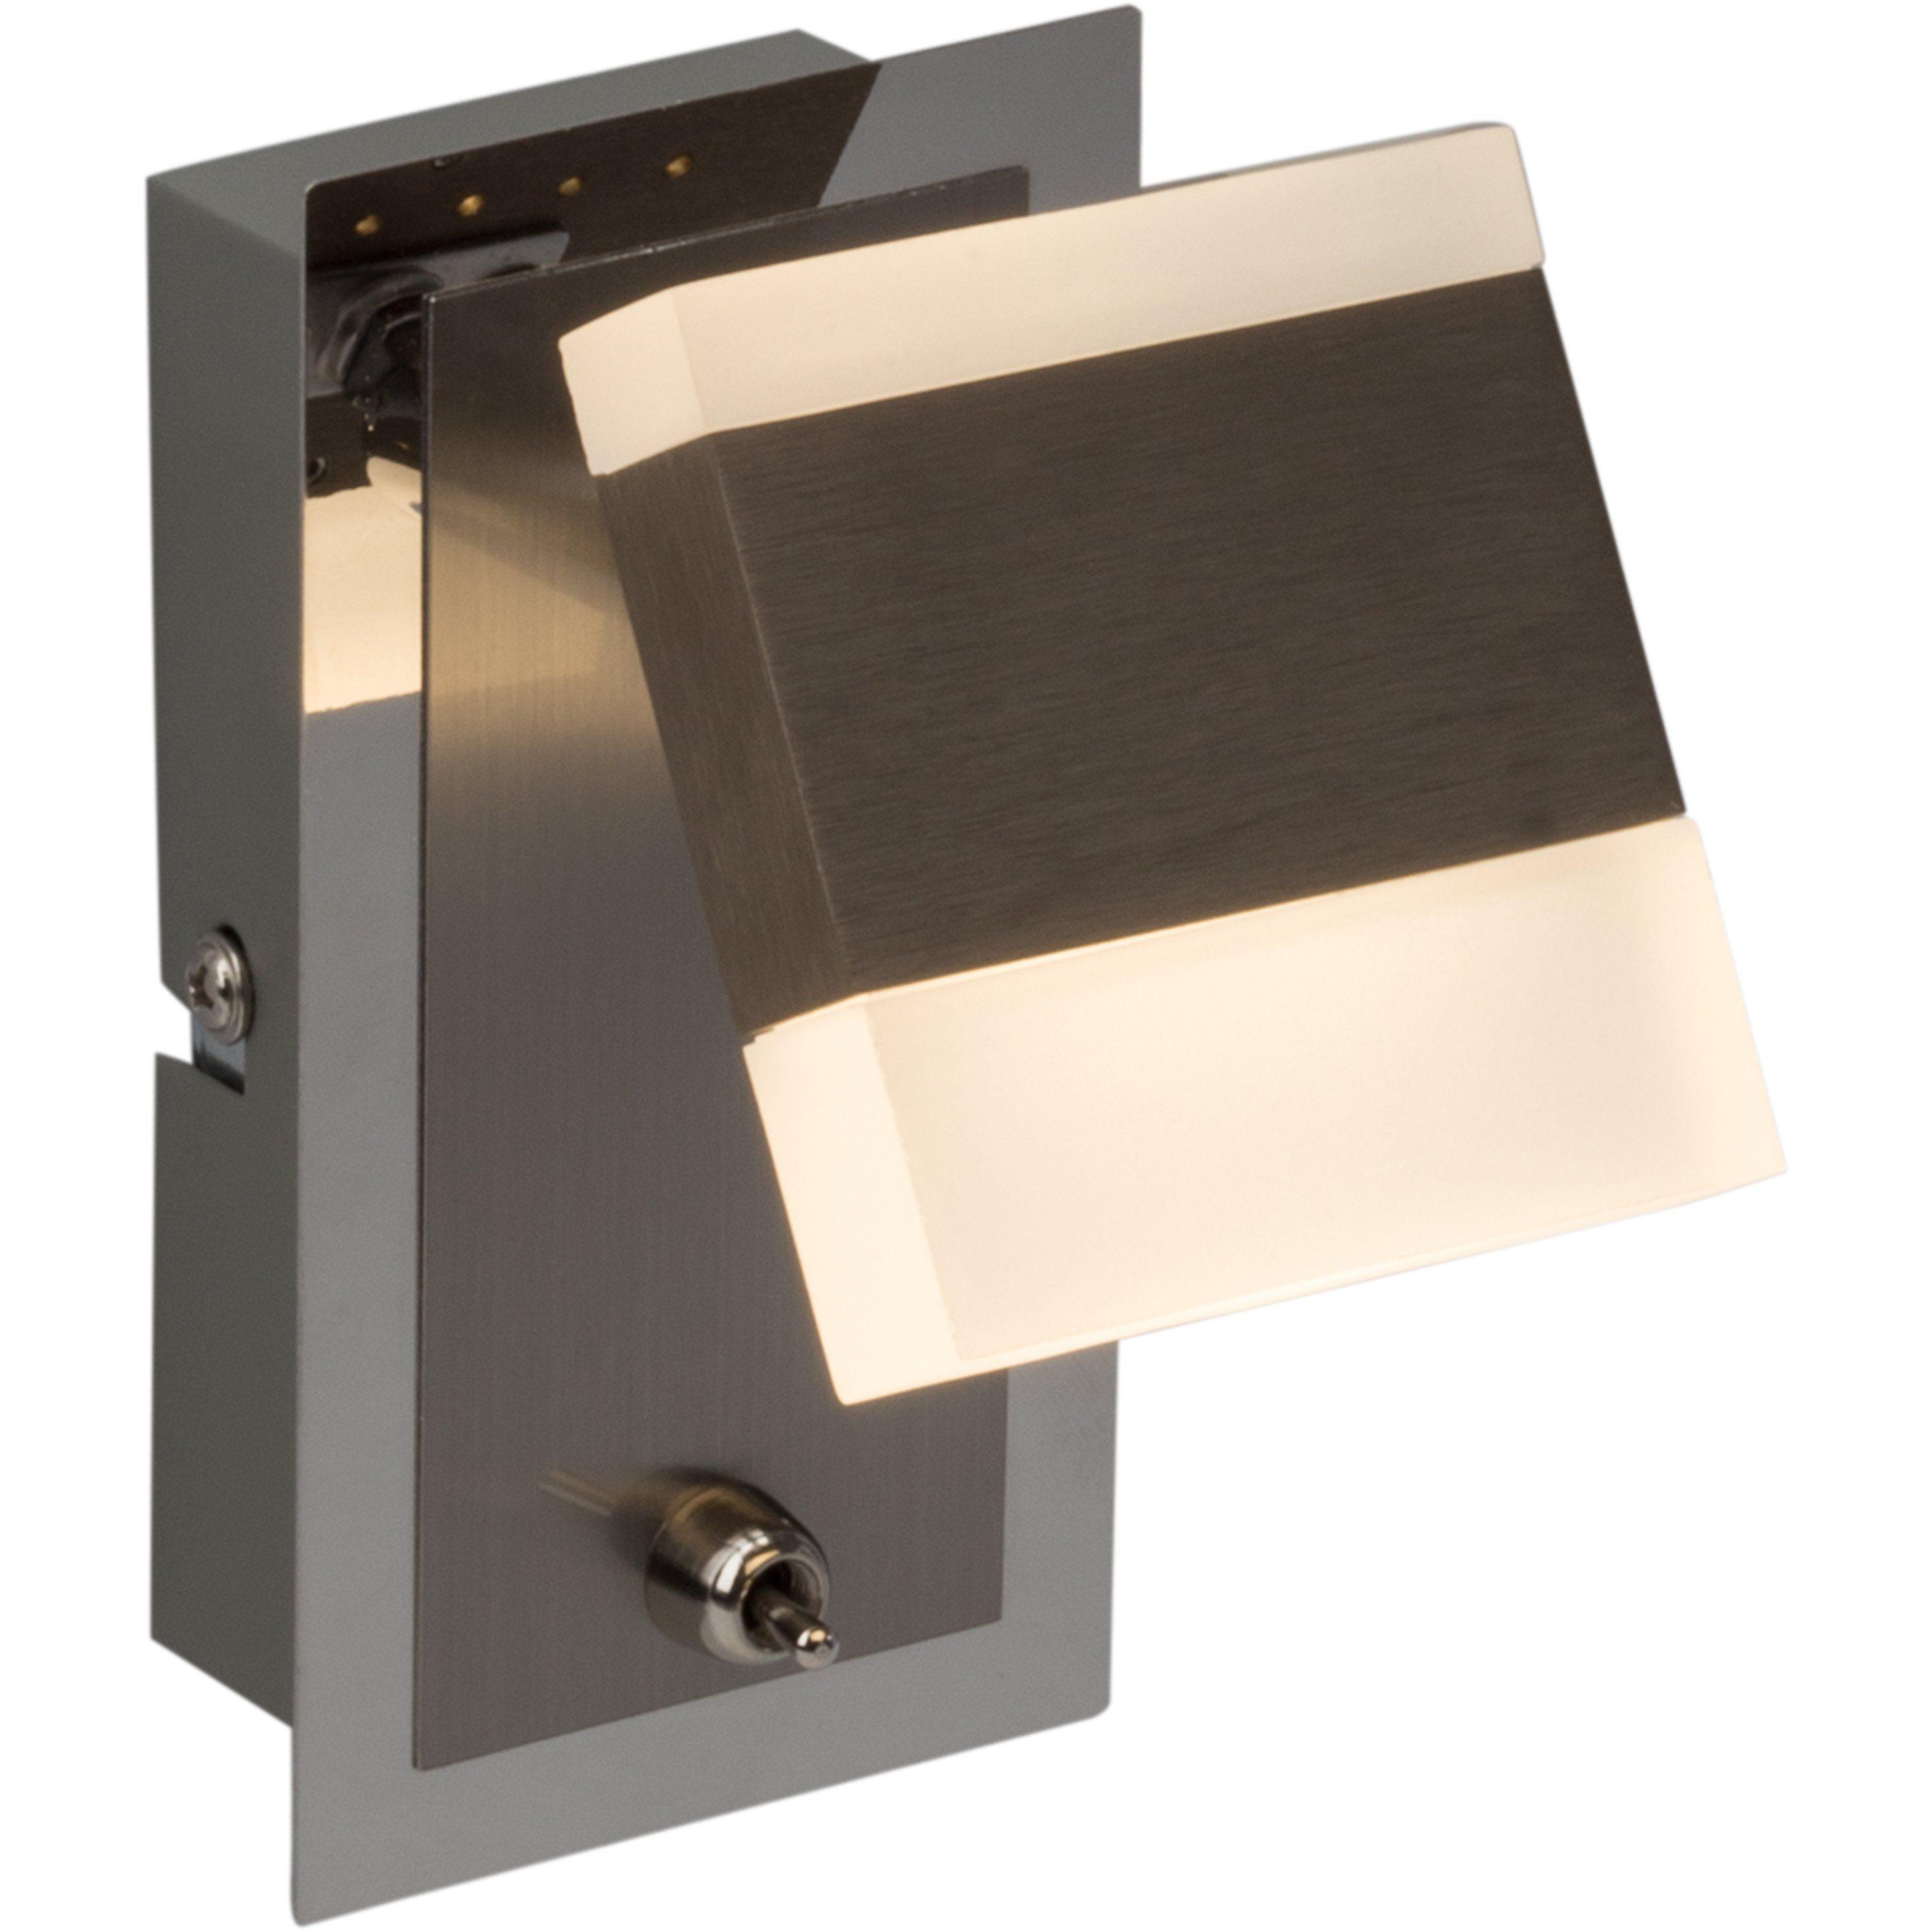 Brilliant Leuchten Target LED Wandspot nickel/chrom